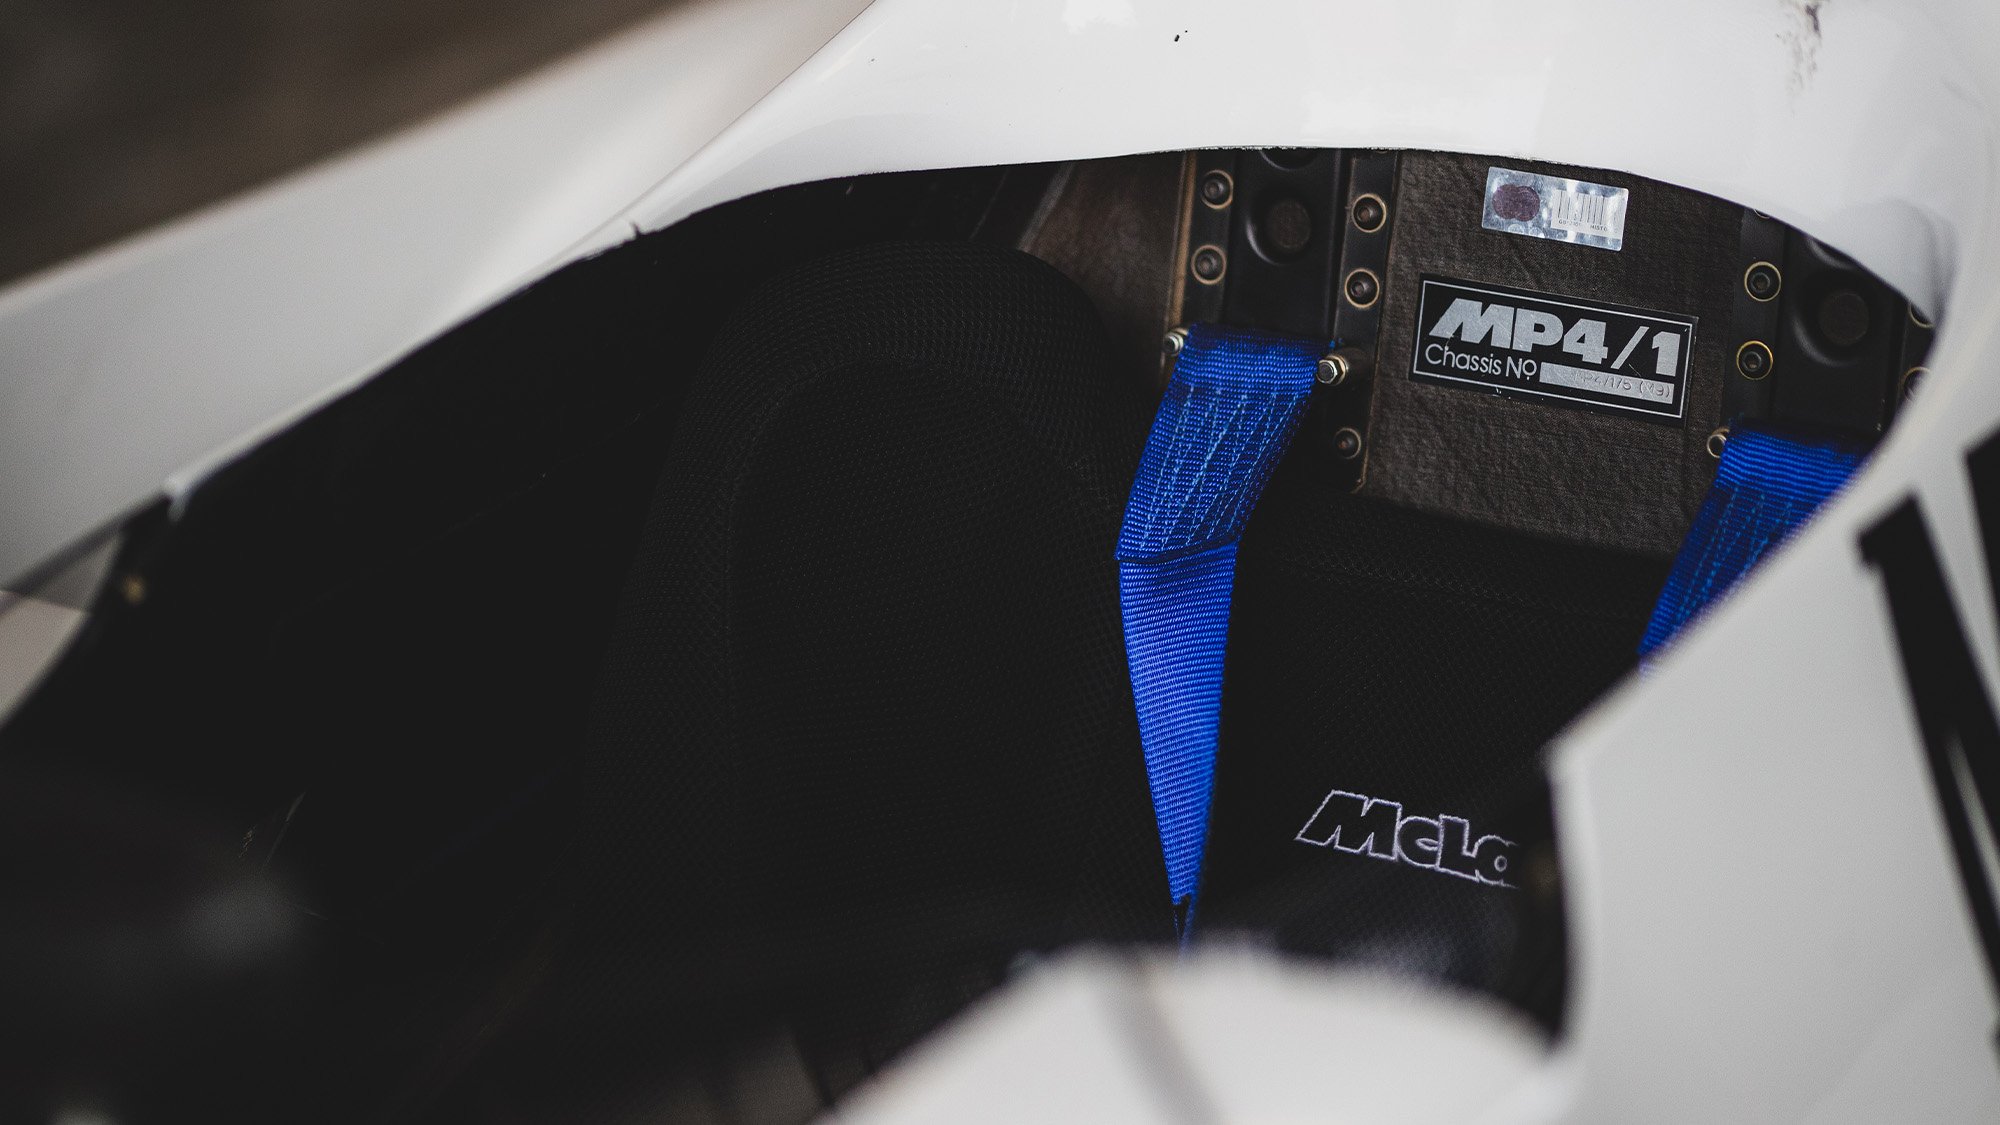 Steve Hartley McLaren MP4-1 at Brands Hatch 2021 chassis number